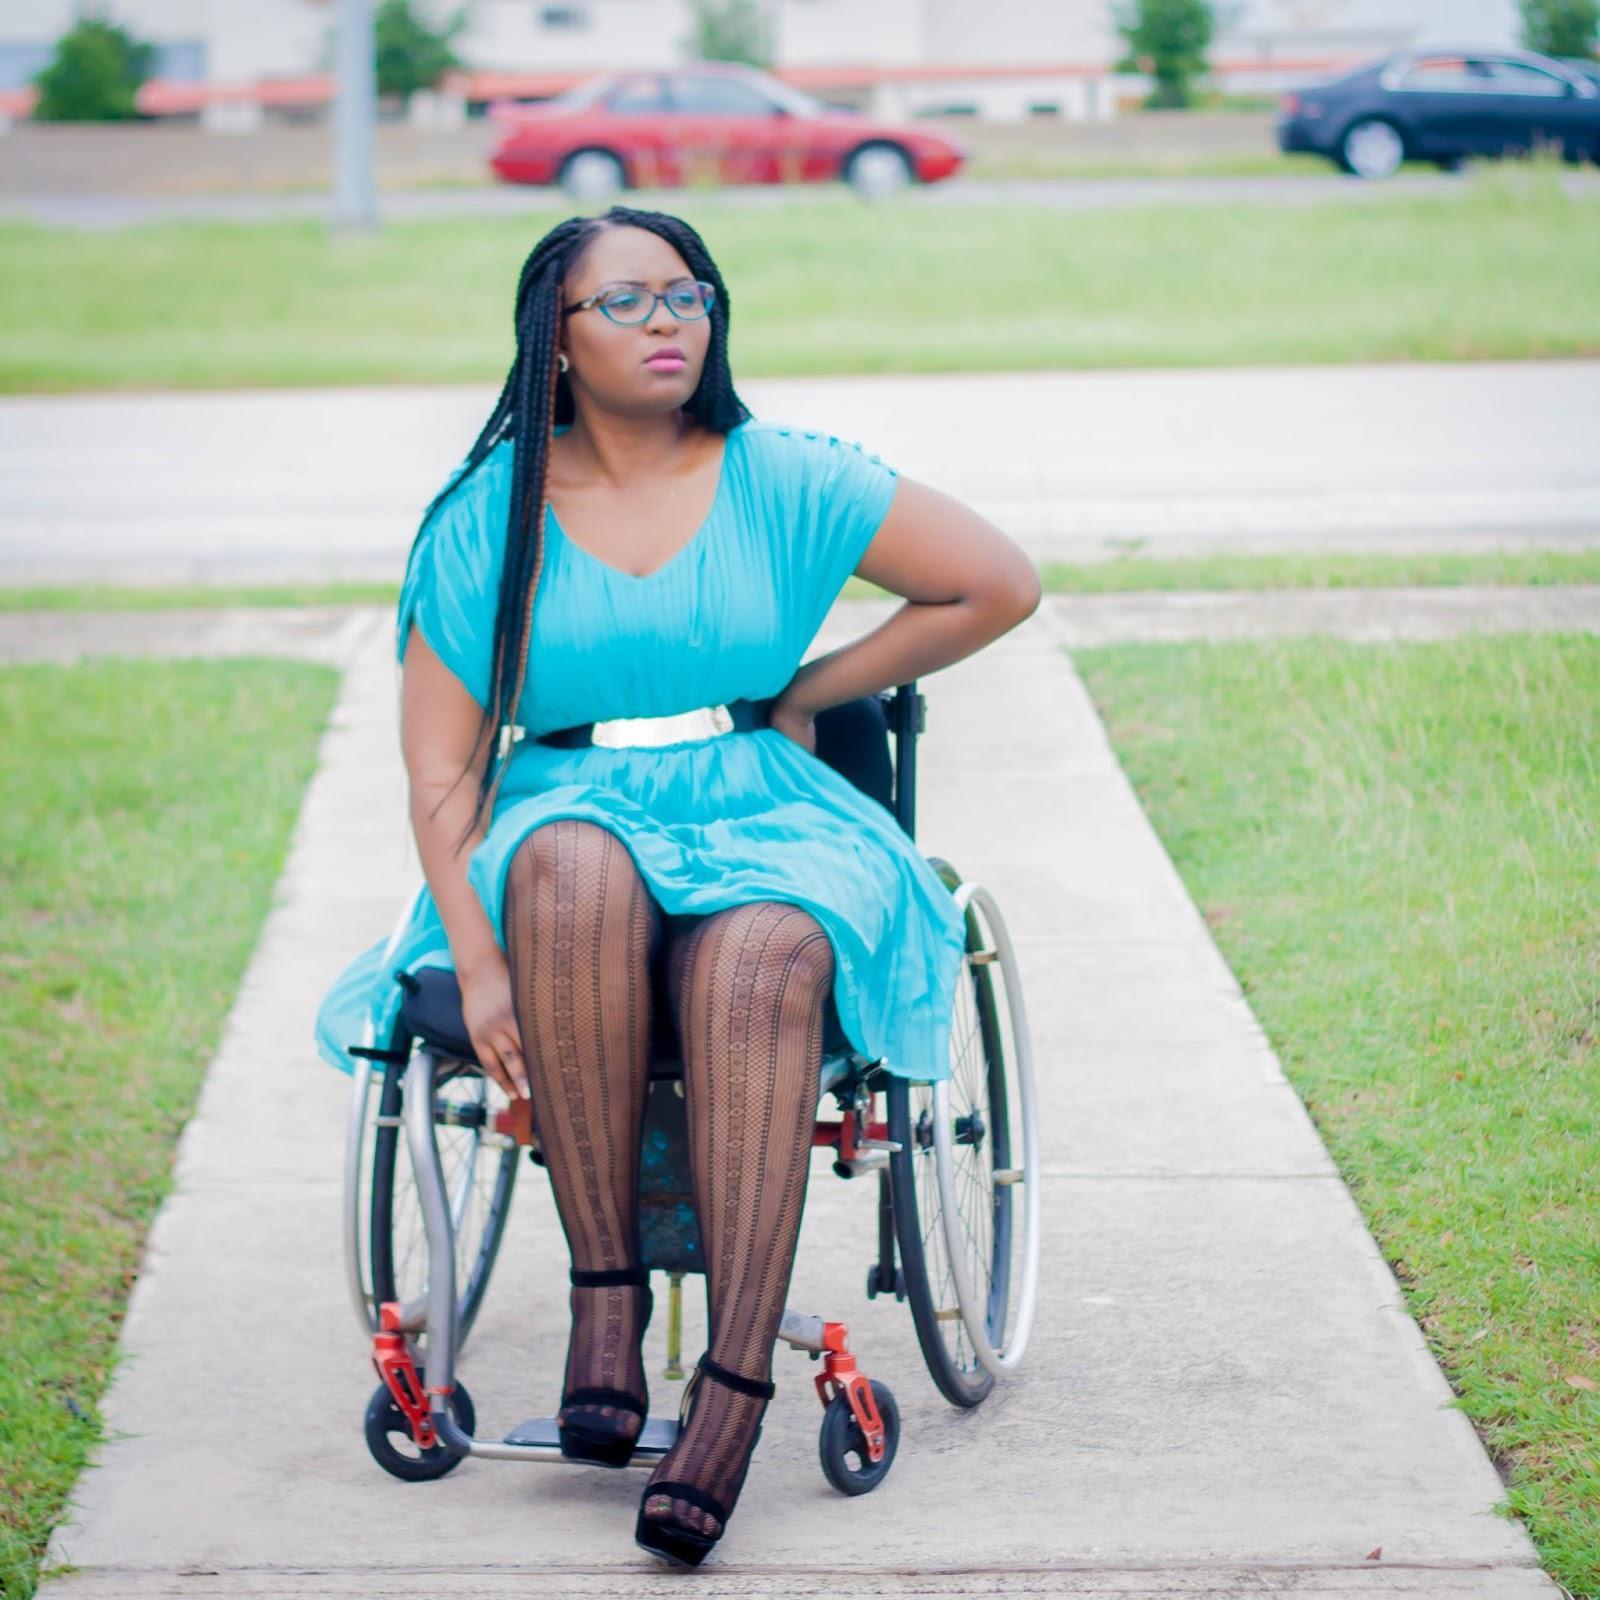 Paraplegic wearing high heels 8